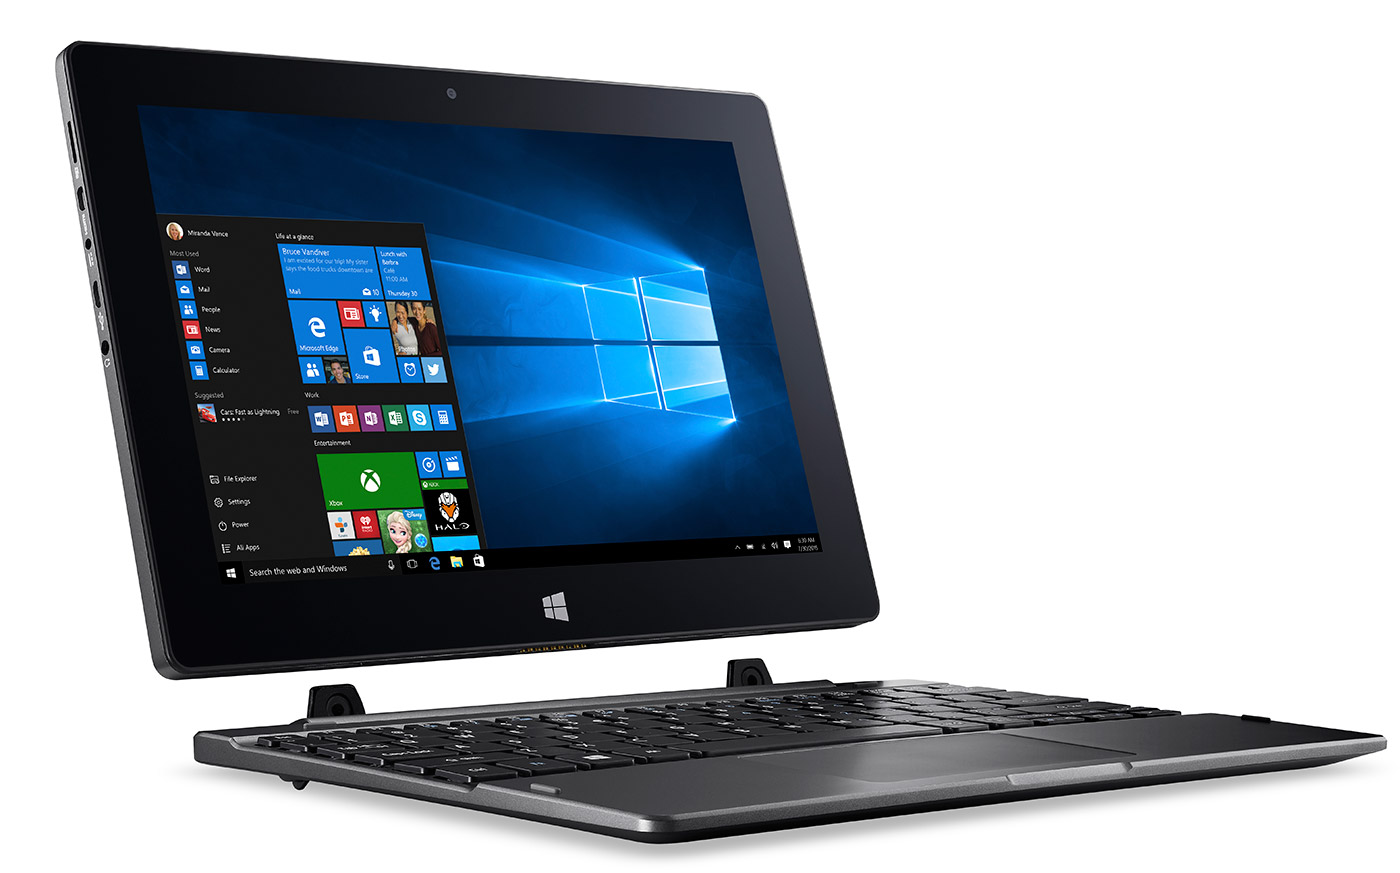 Acer reveals Intel Skylake laptops with fingerprint readers